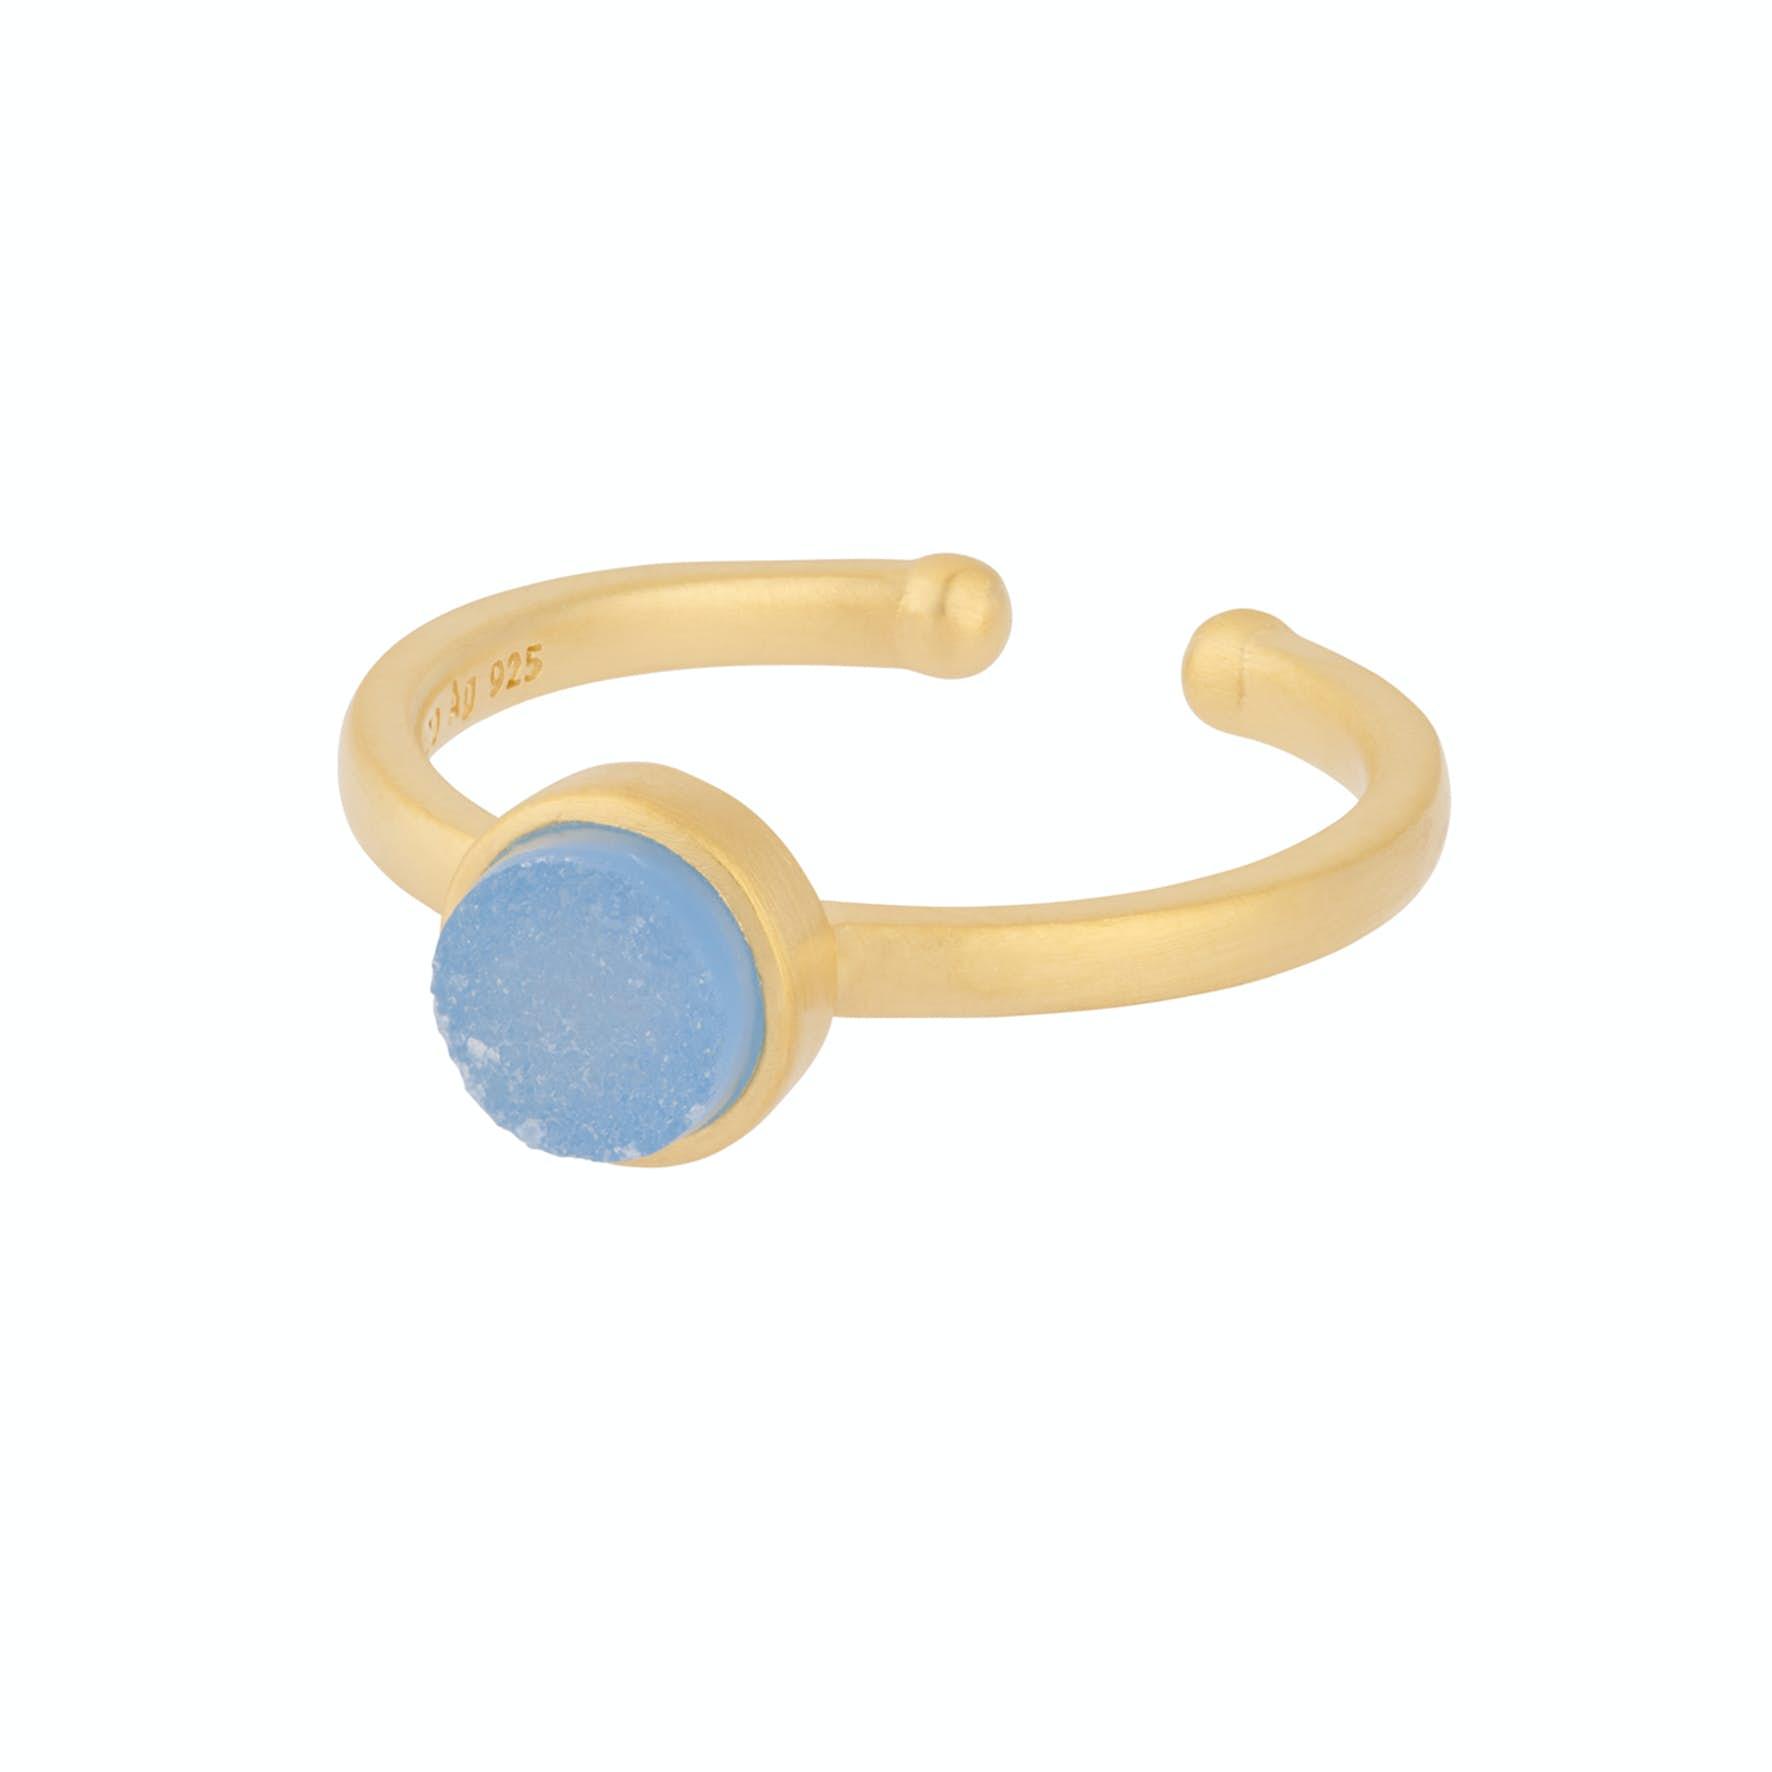 Small Shallow Ring von Pernille Corydon in Vergoldet-Silber Sterling 925